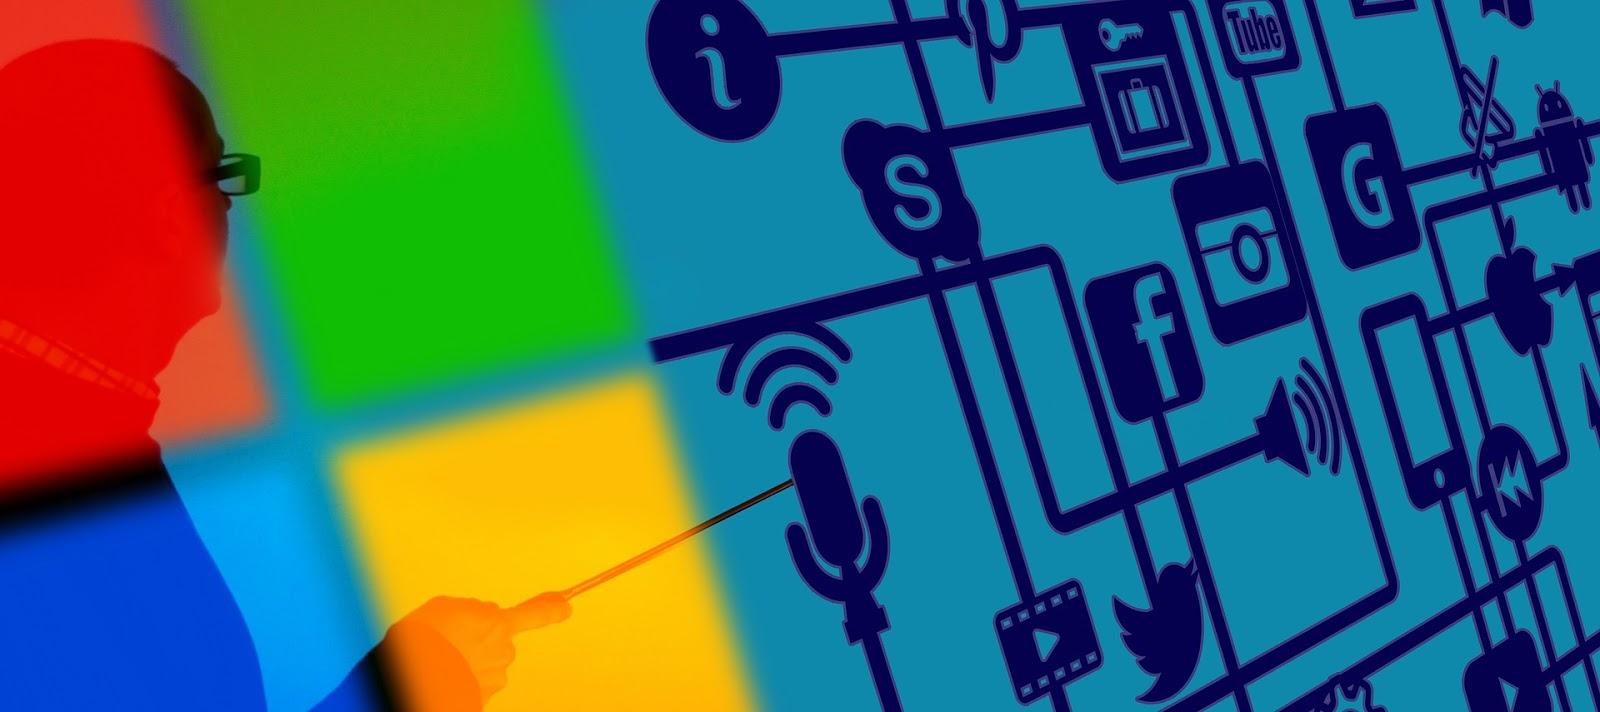 3 Cara Mengganti Wallpaper Di Windows 10 Dengan Mudah